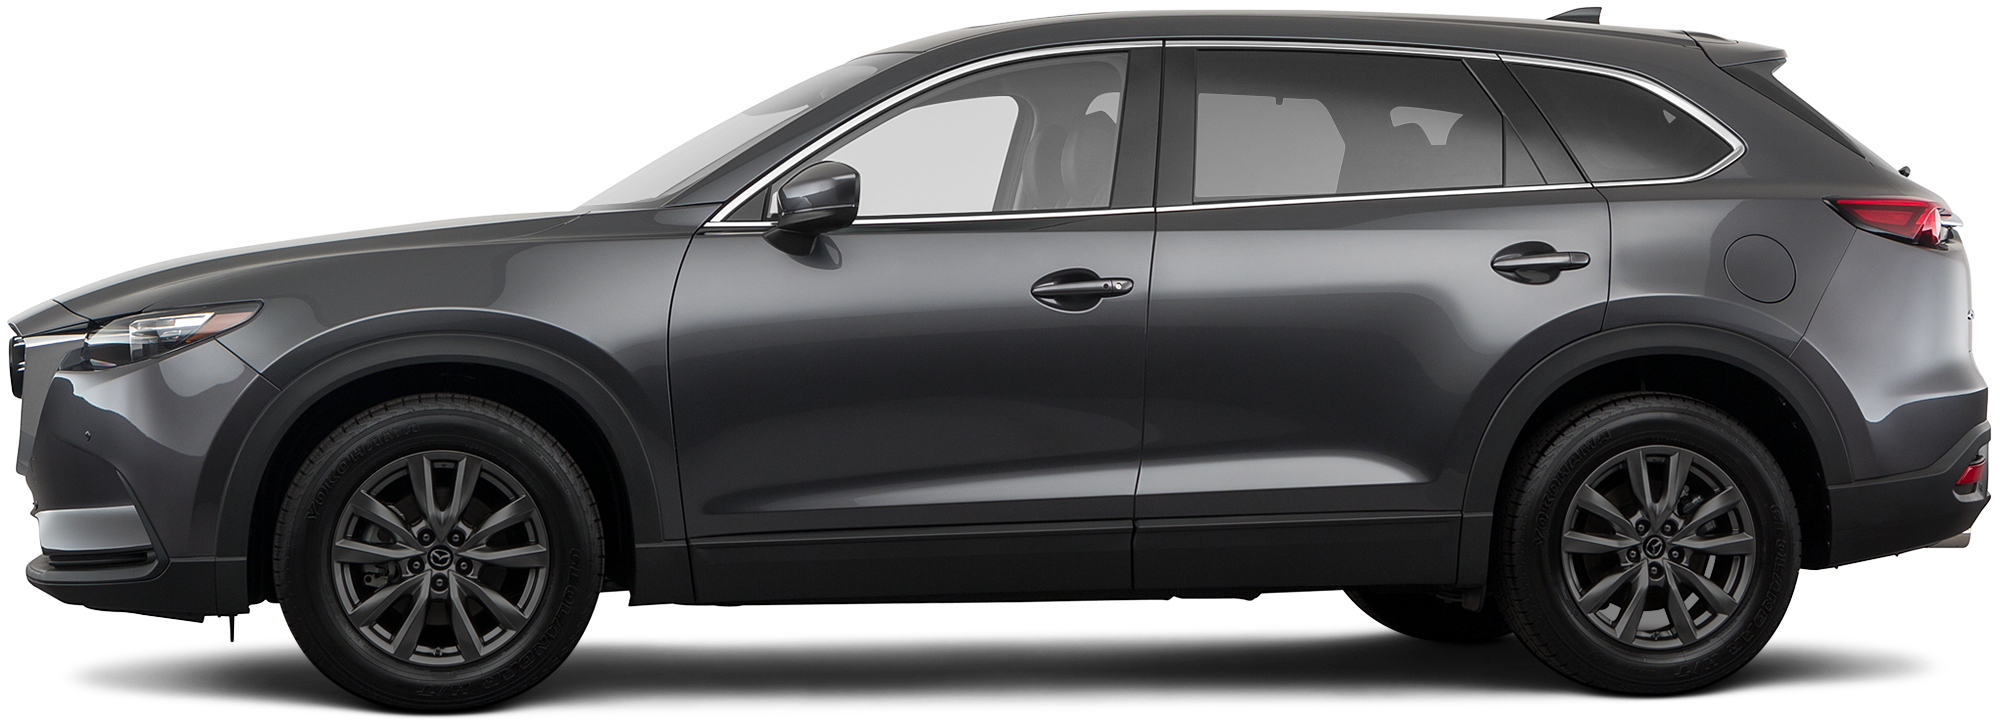 2021 Mazda Mazda CX-9 SUV Sport